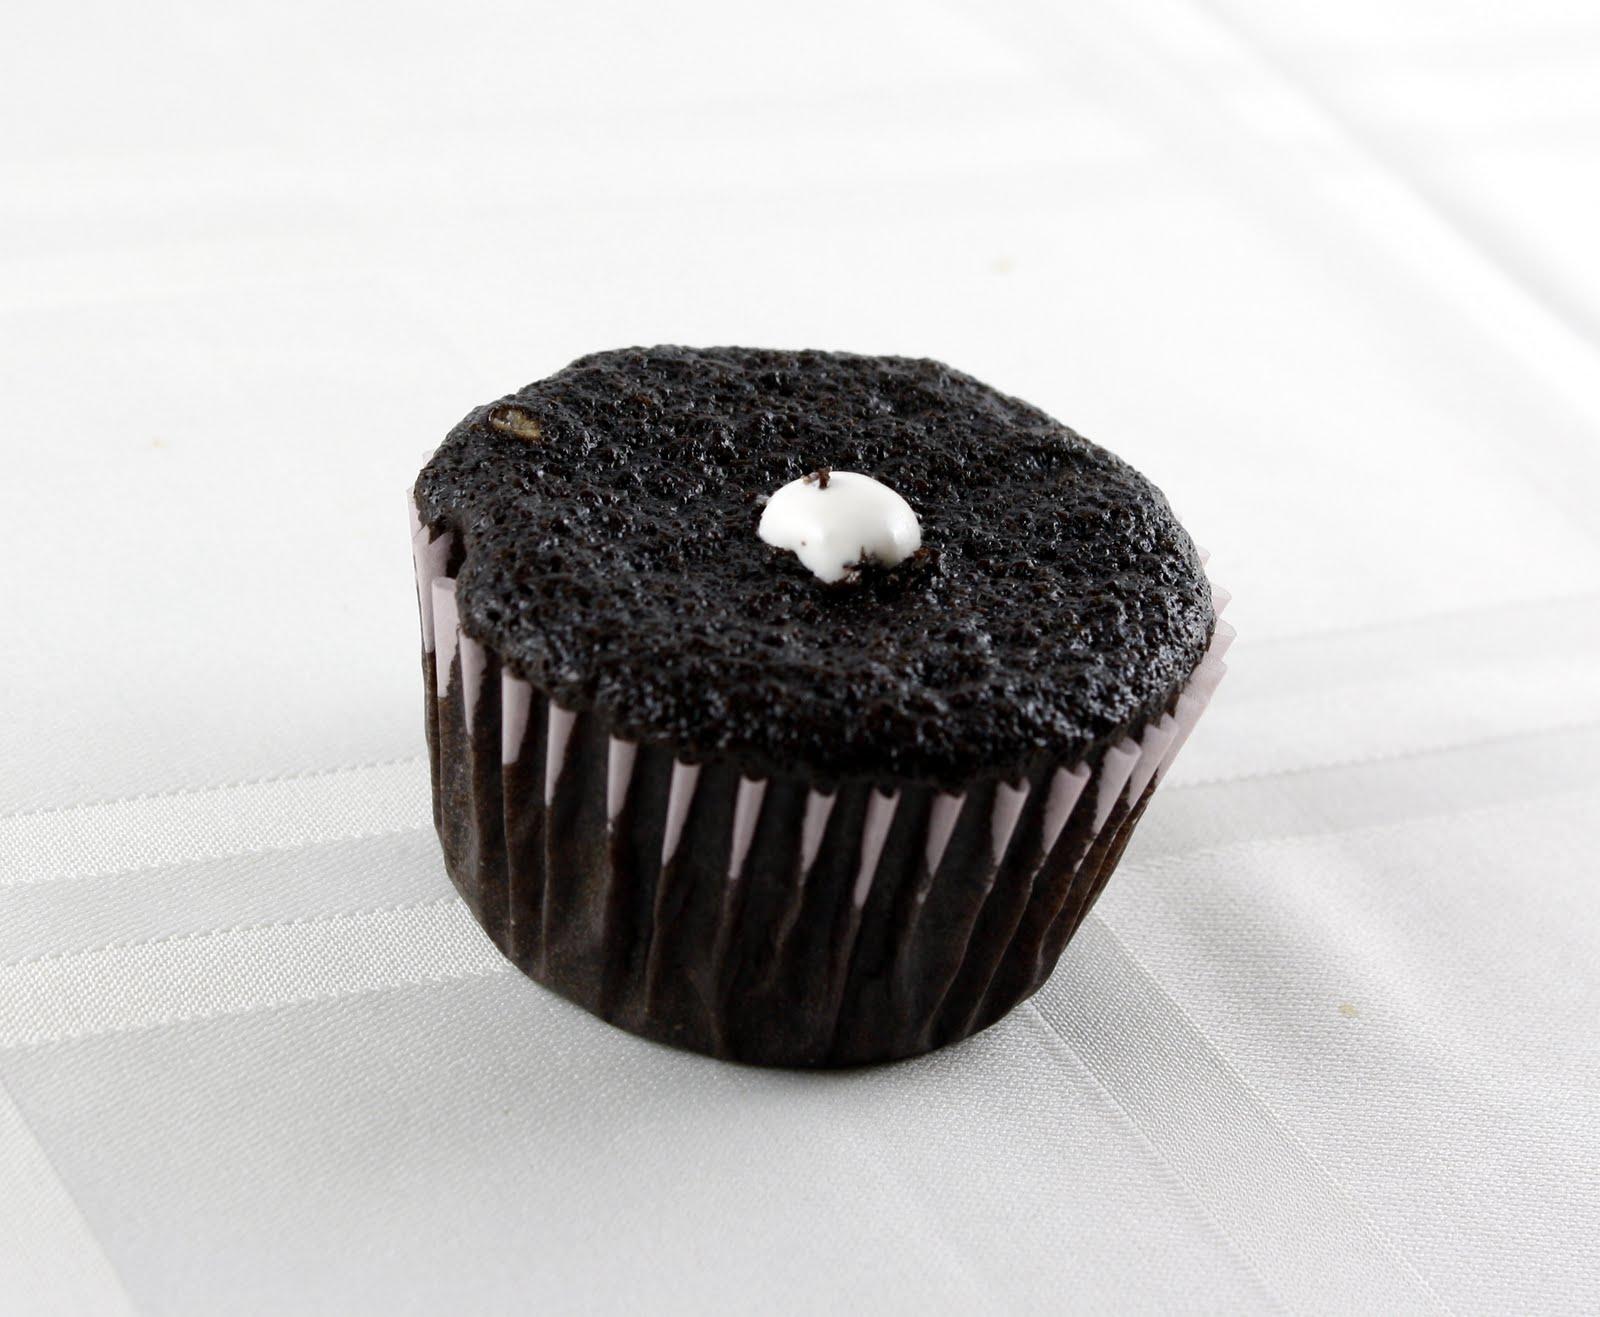 show me how to make cupcakes